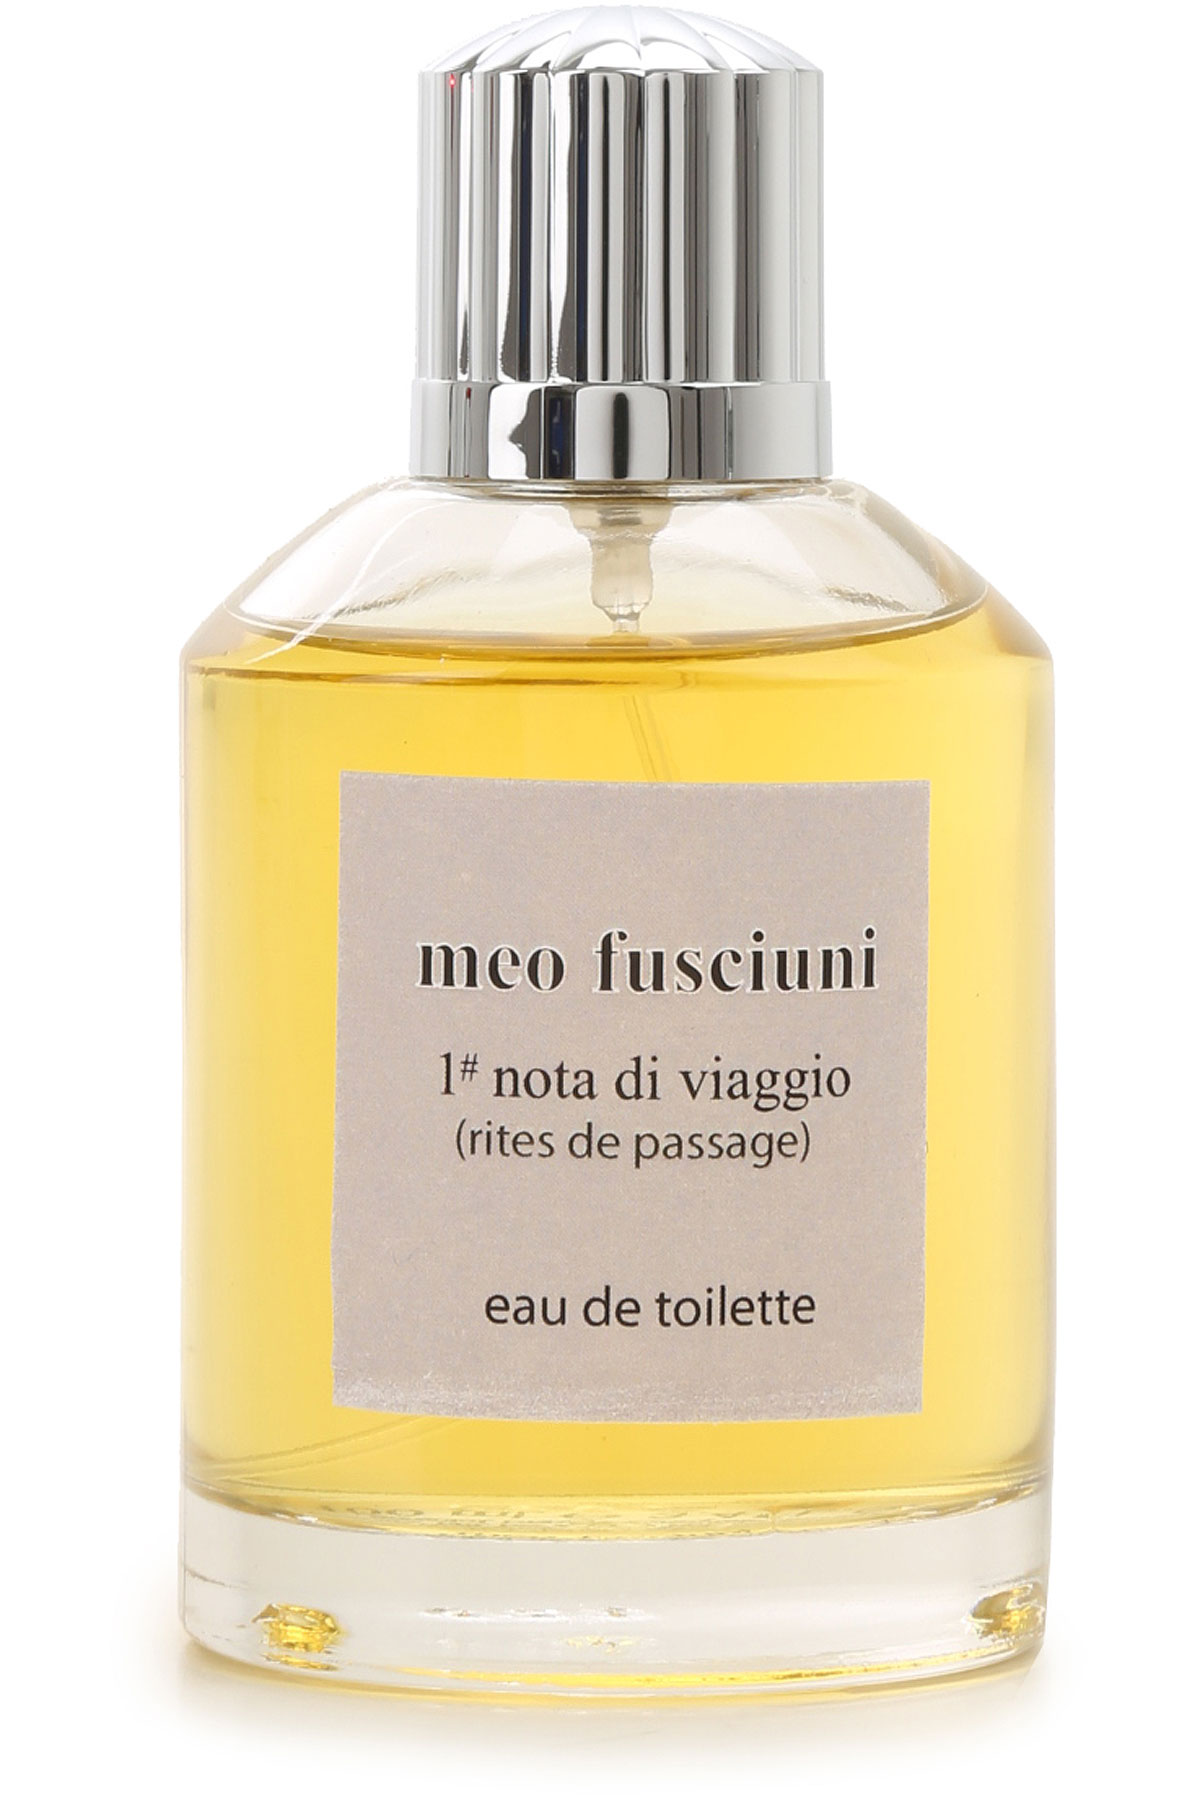 Meo Fusciuni Fragrances for Women, 1 Nota Di Viaggio - Eau De Toilette - 100 Ml, 2019, 100 ml